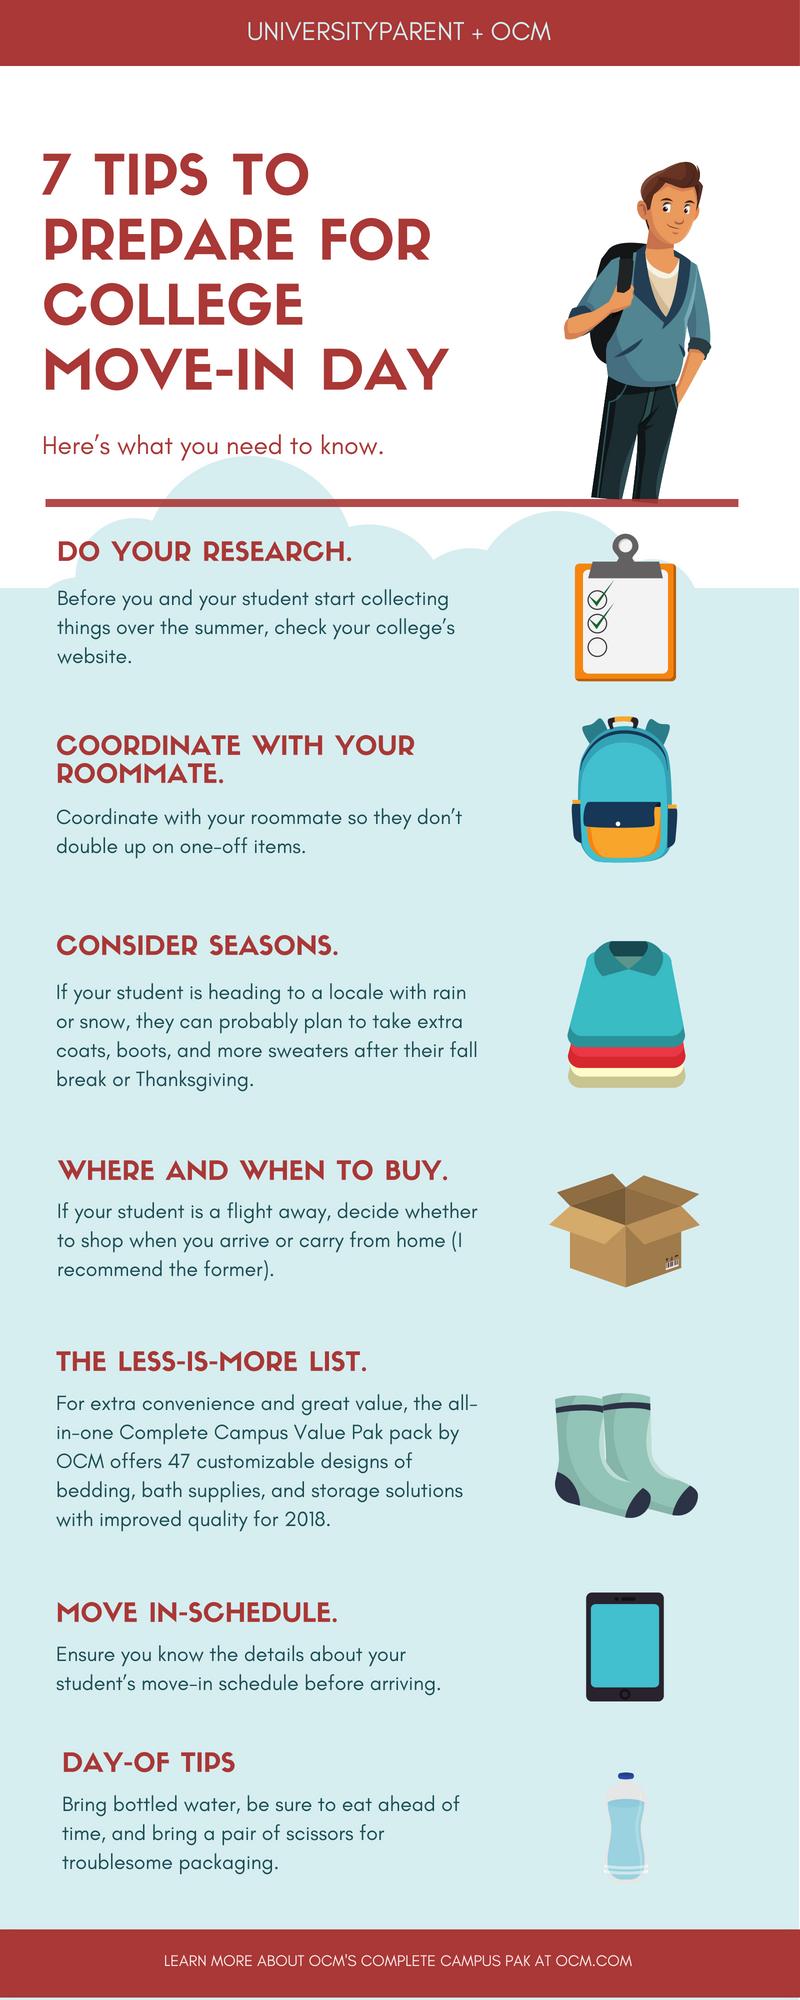 7 Tips to Prepare for College Move-In